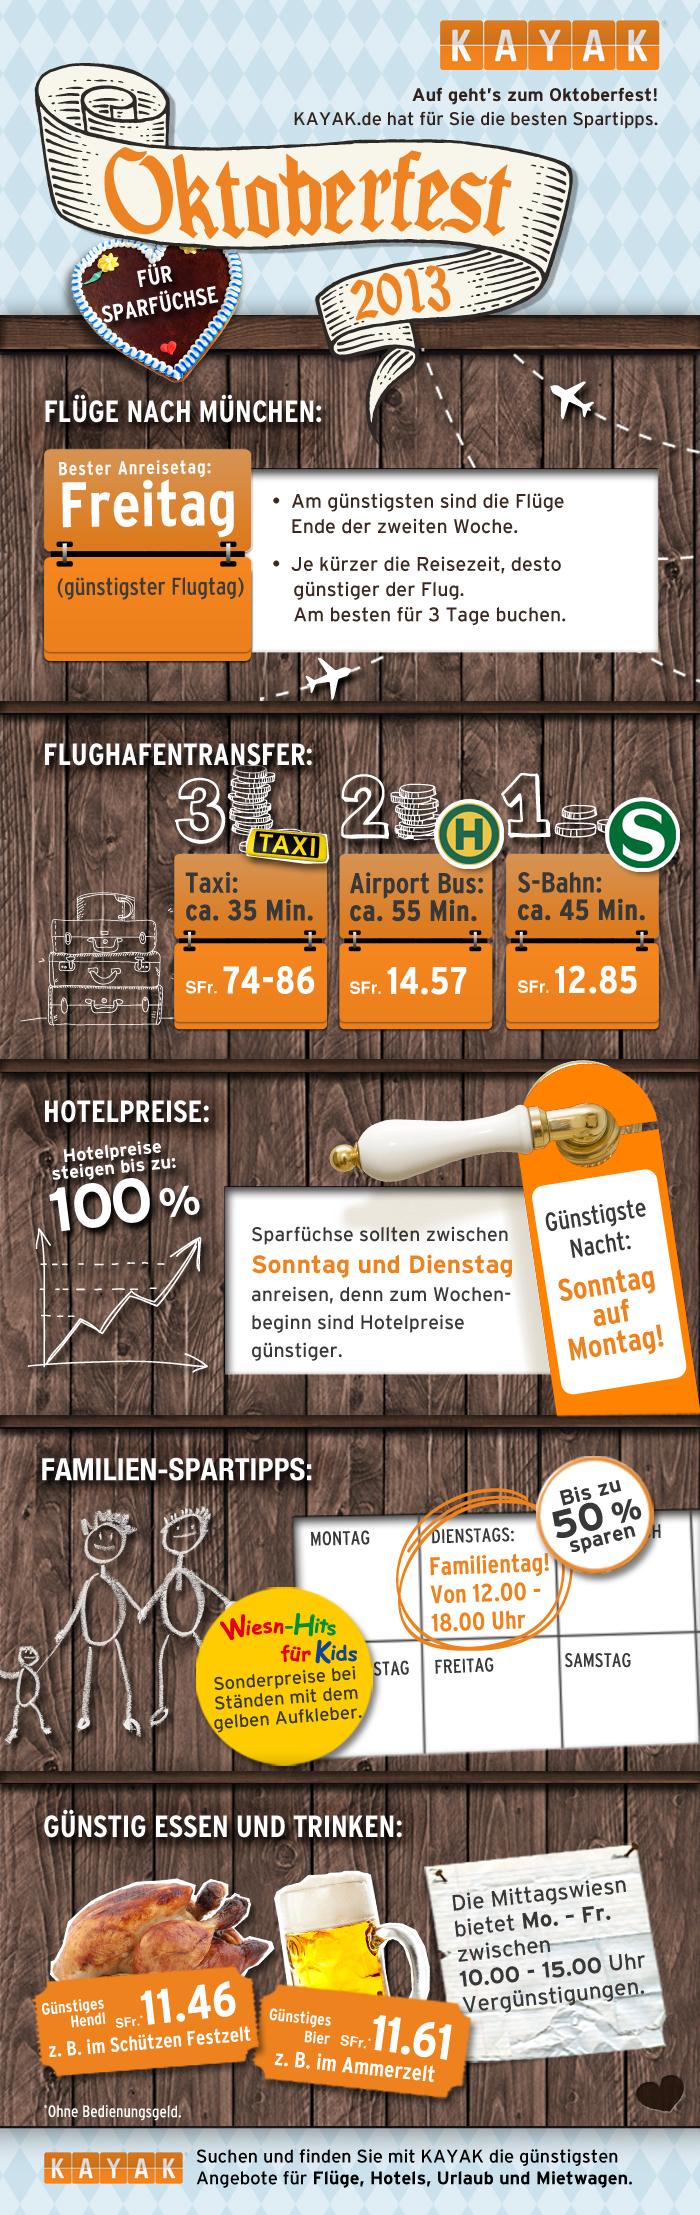 KAYAK-oktoberfest-infographic-ch